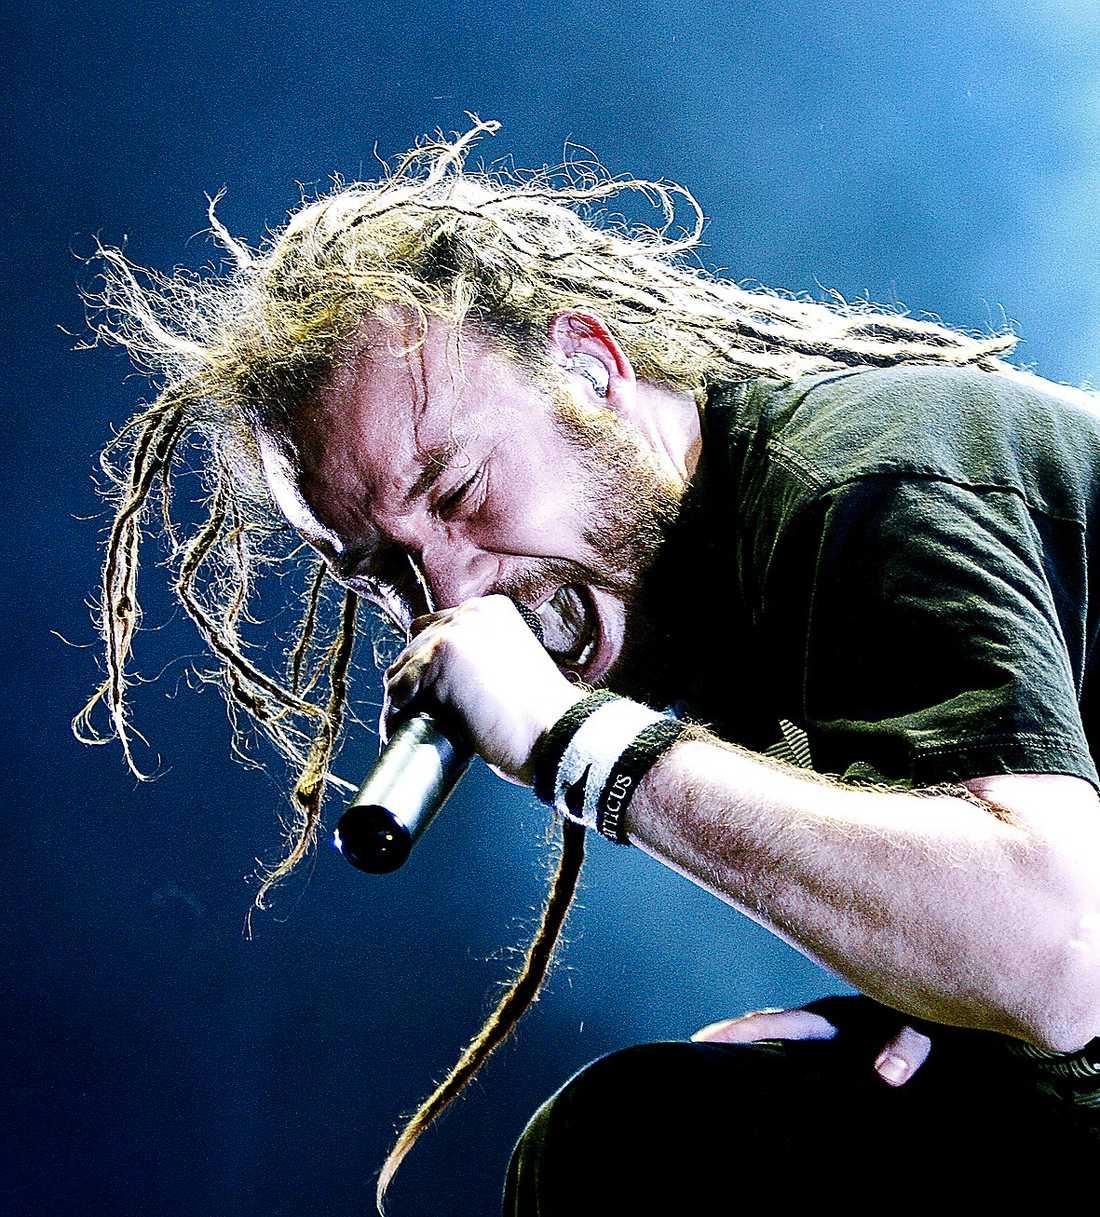 Sångaren Anders Fridén längtar efter turnén.